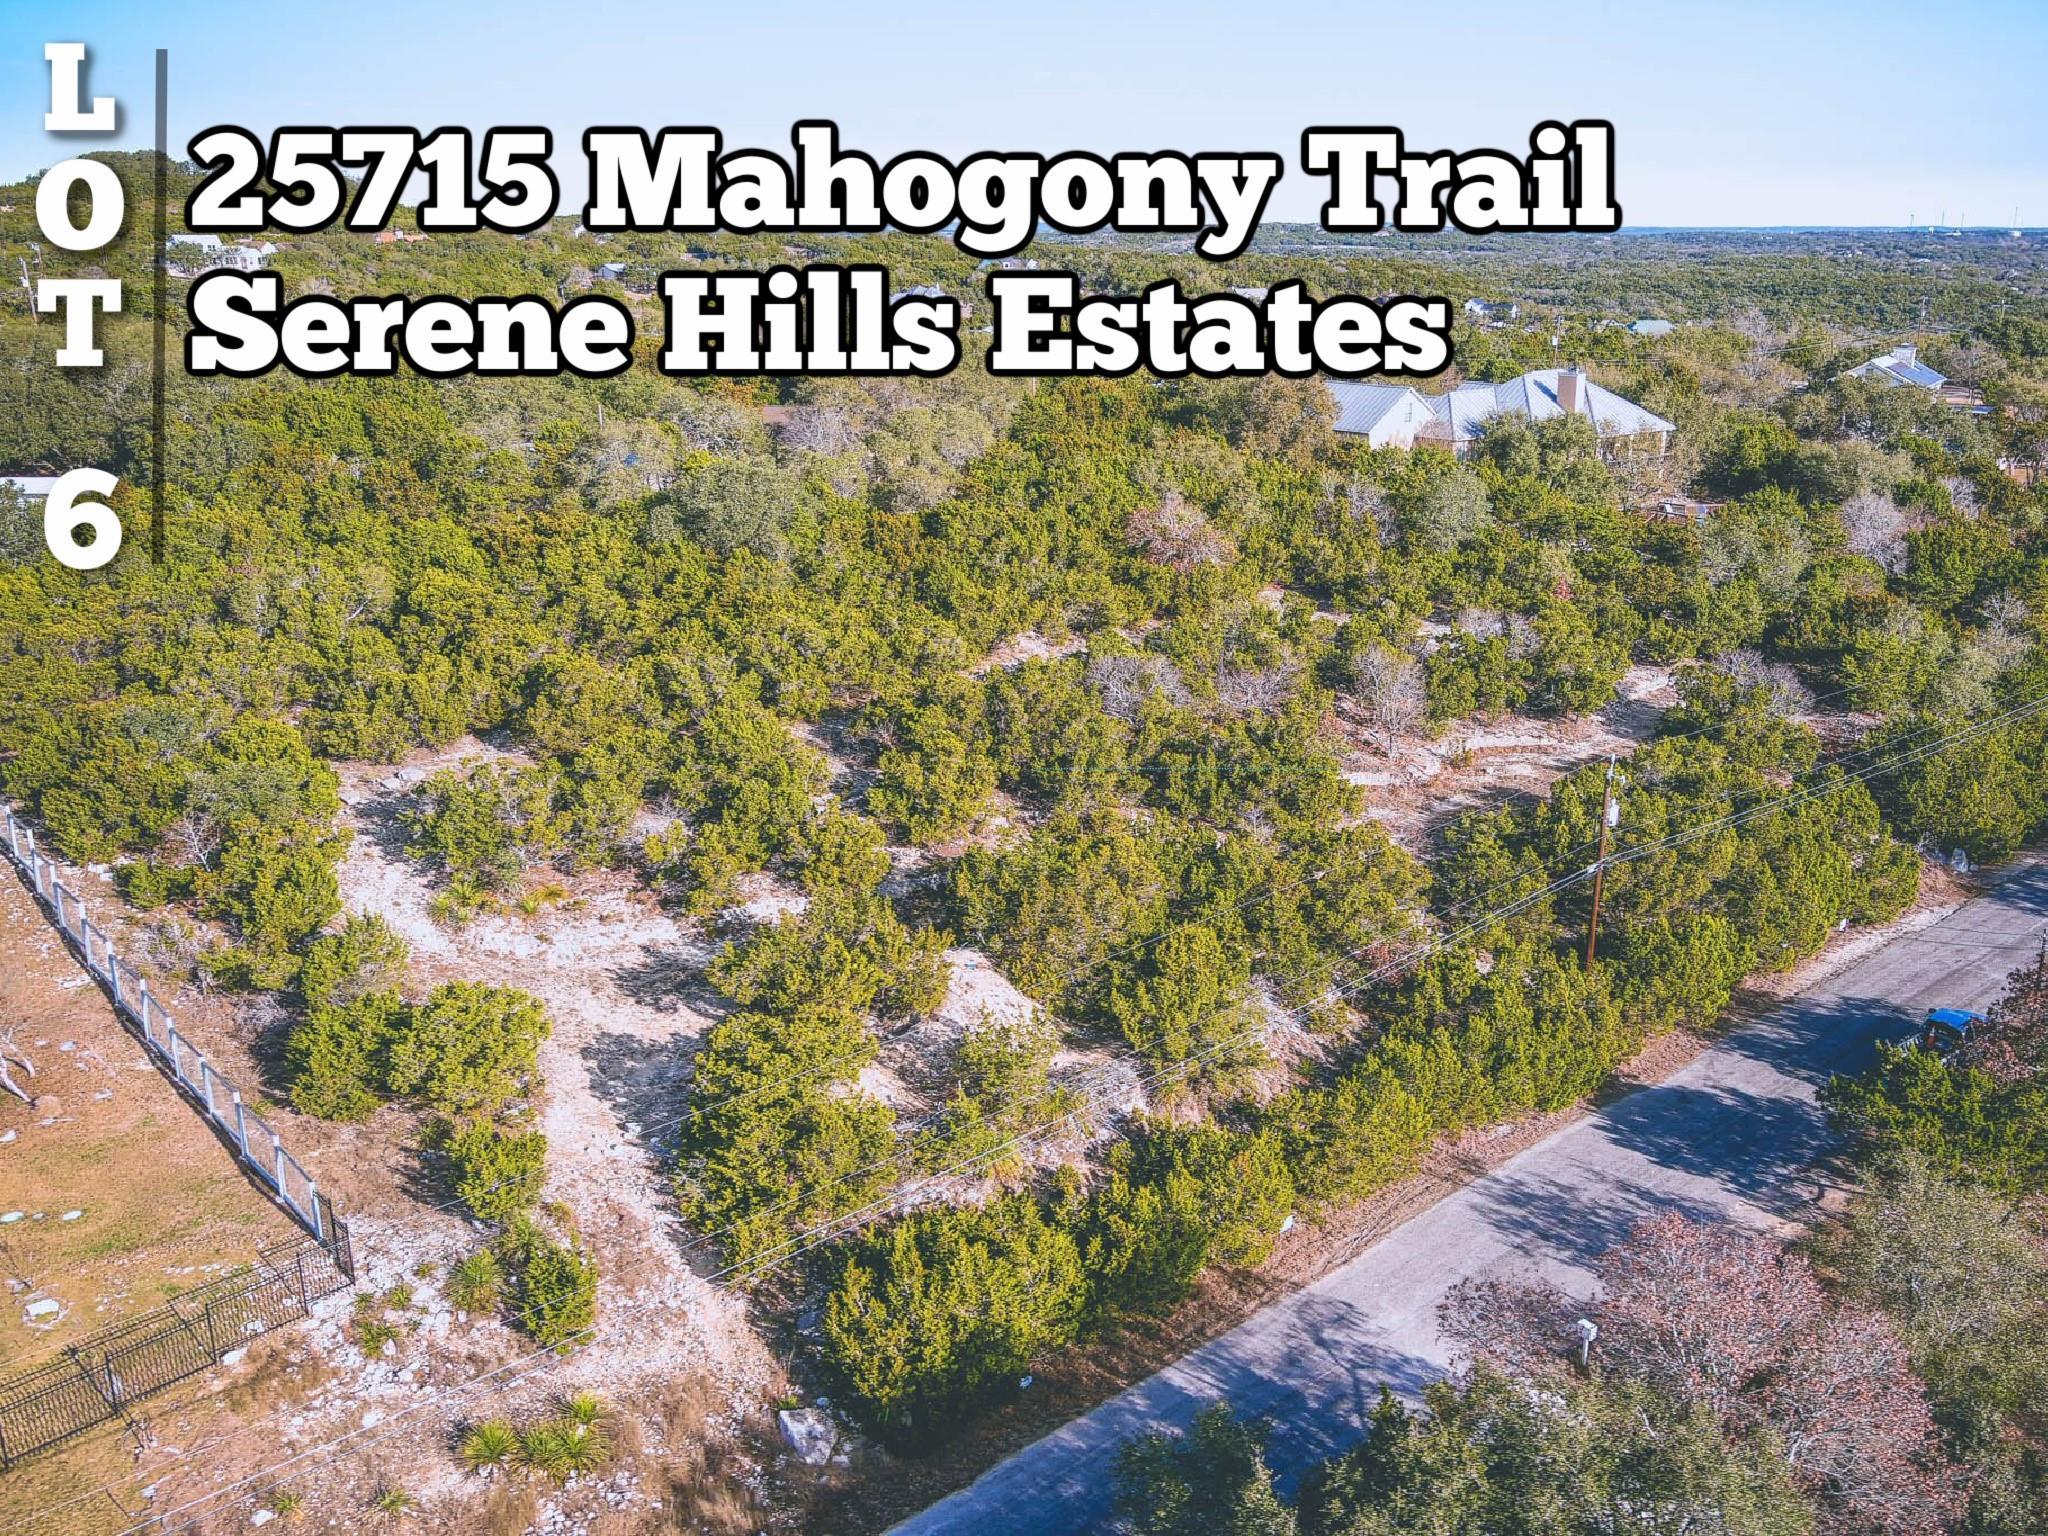 25715 Mahogony Trail Property Photo - San Antonio, TX real estate listing